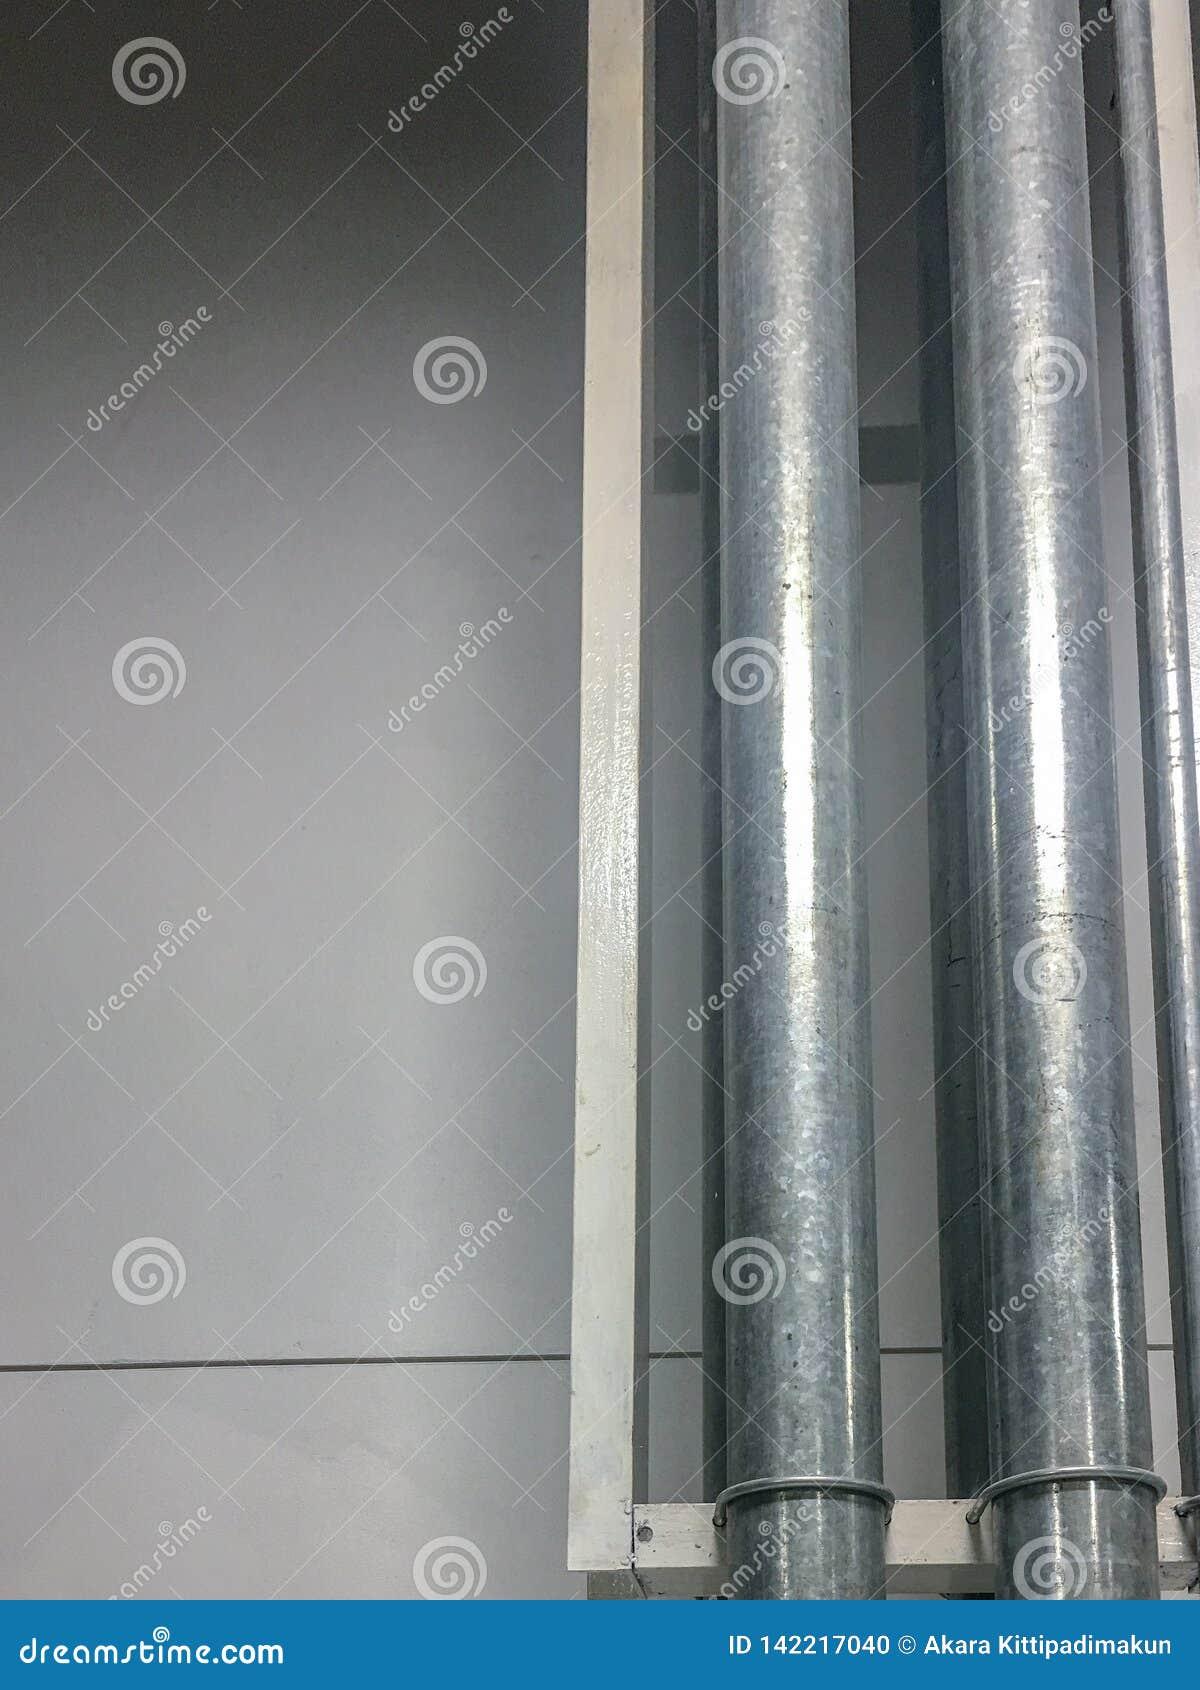 Kabel i metallrör